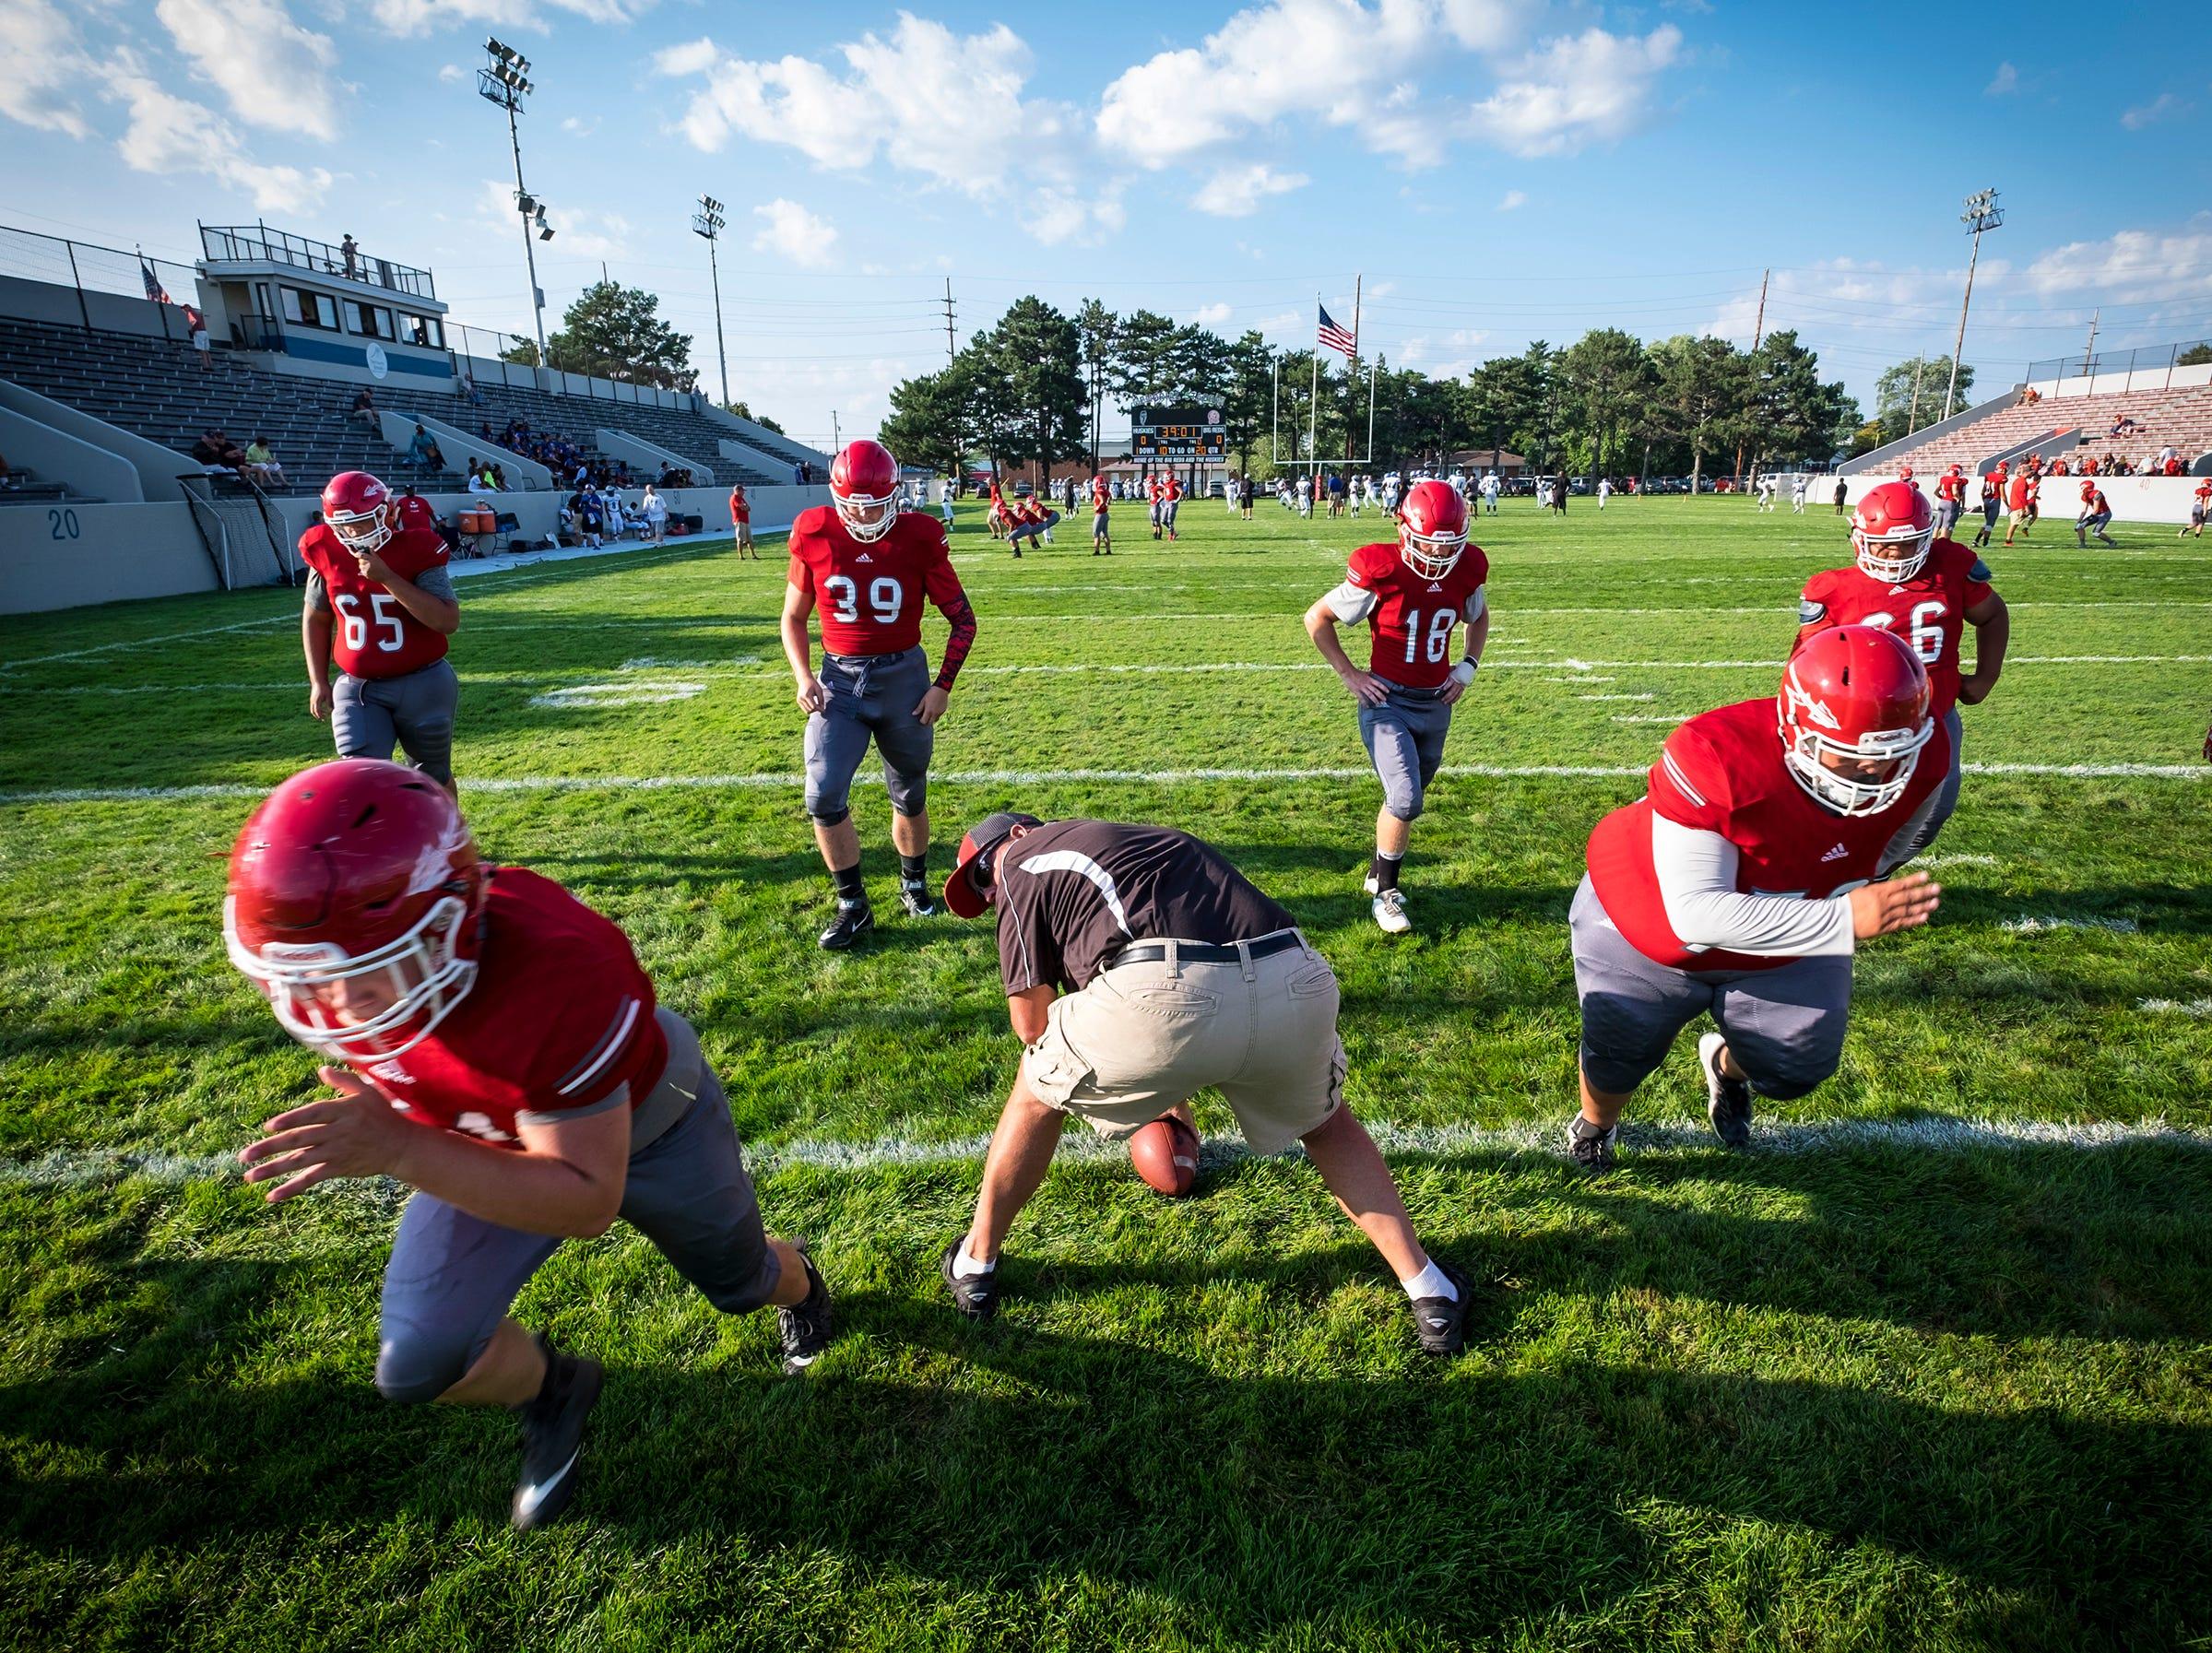 The Port Huron High School football team runs warm-up drills Thursday, Aug. 23, 2018, before the Big Reds' week 1 football game against Carman Ainsworth High School at Memorial Stadium.